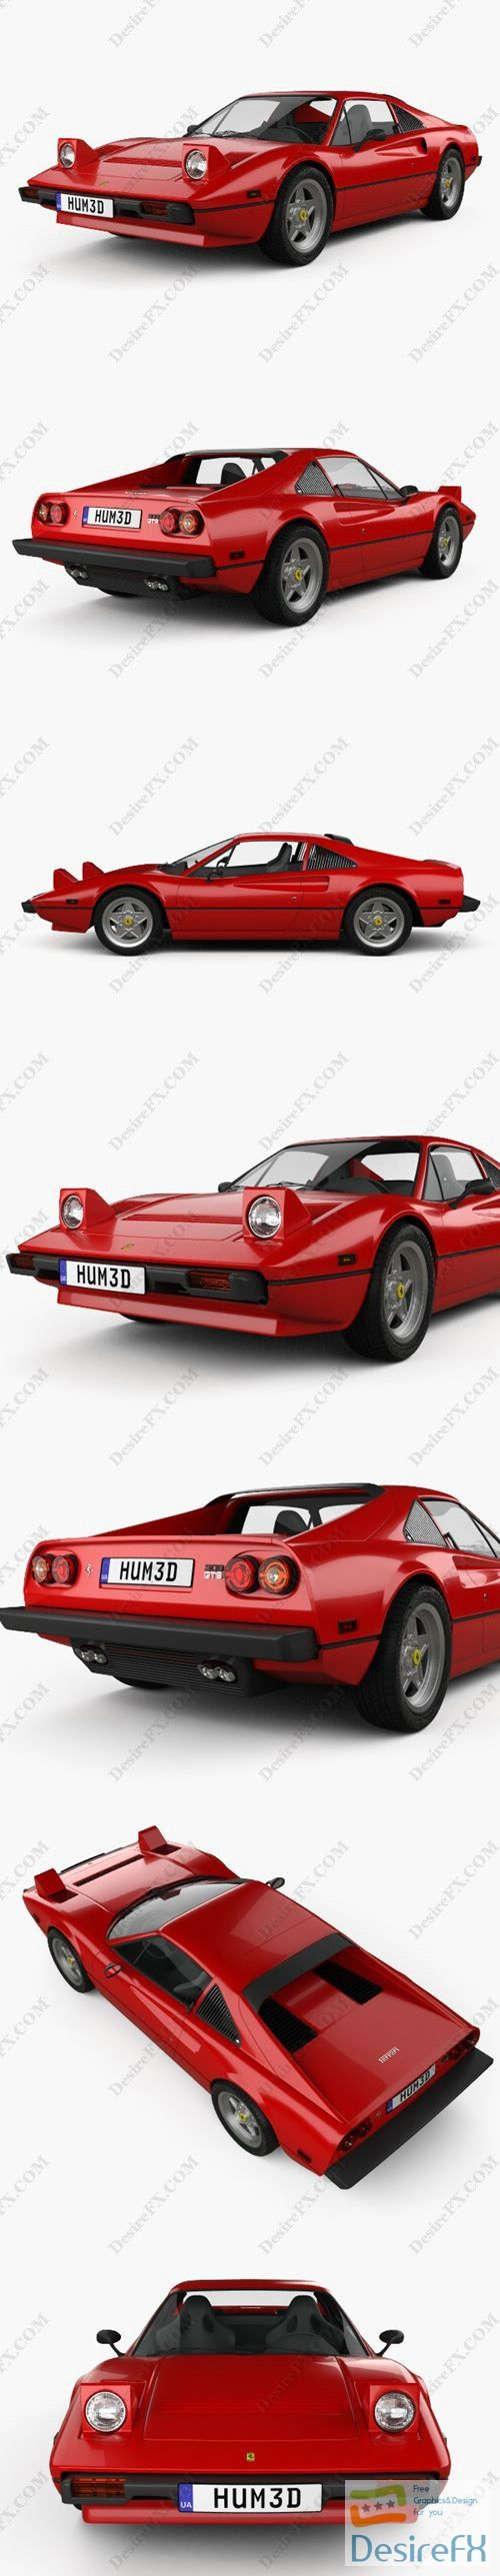 Ferrari 308 GTB GTS 1975 3D Model